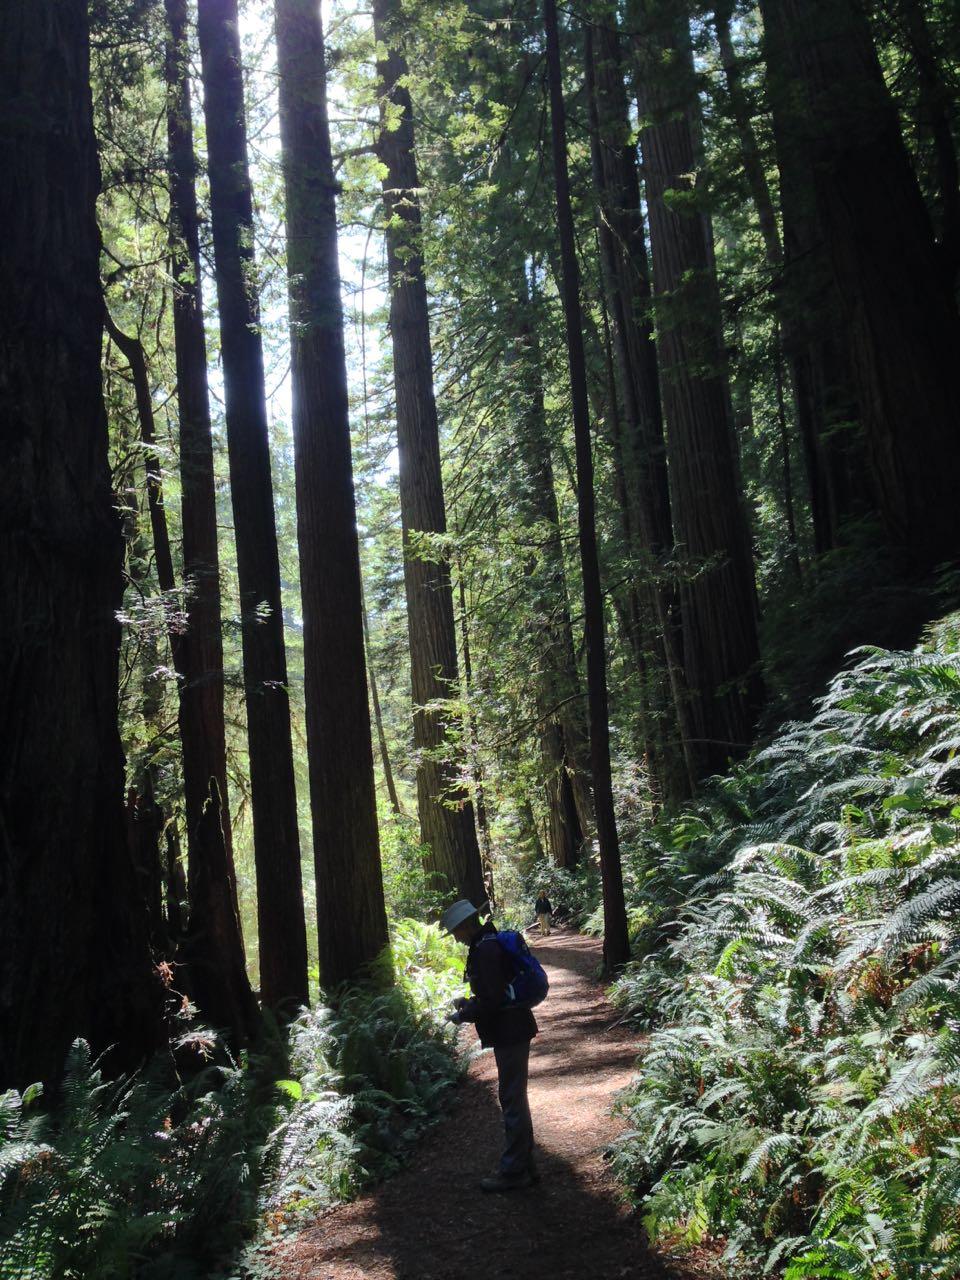 Redwoods 2017 10 08 269 Of 287